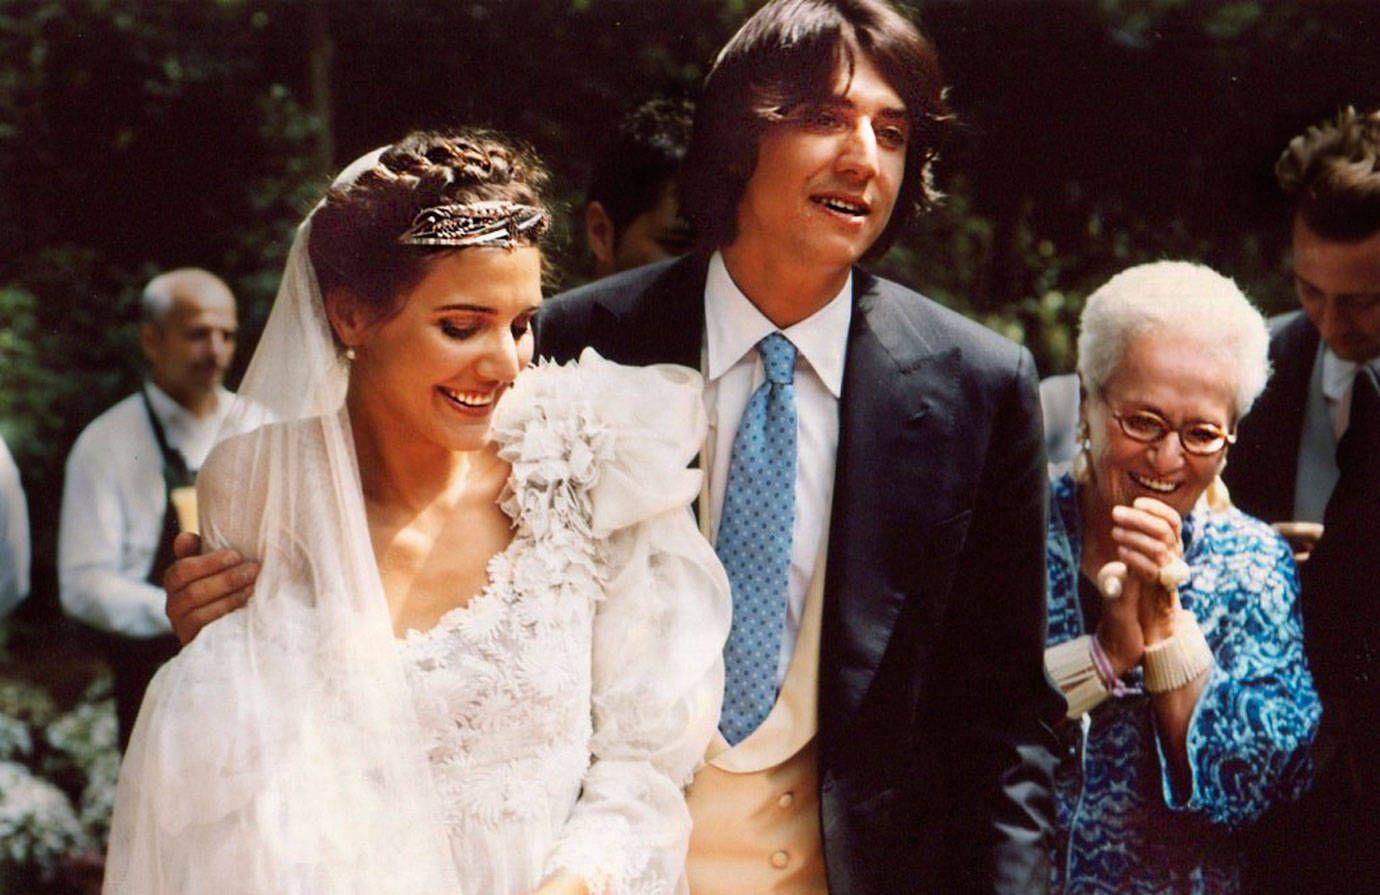 4906bdb2a5e6 Photos of Margherita Missioni Wedding - Photos of Marghertia Missoni s  Wedding Day